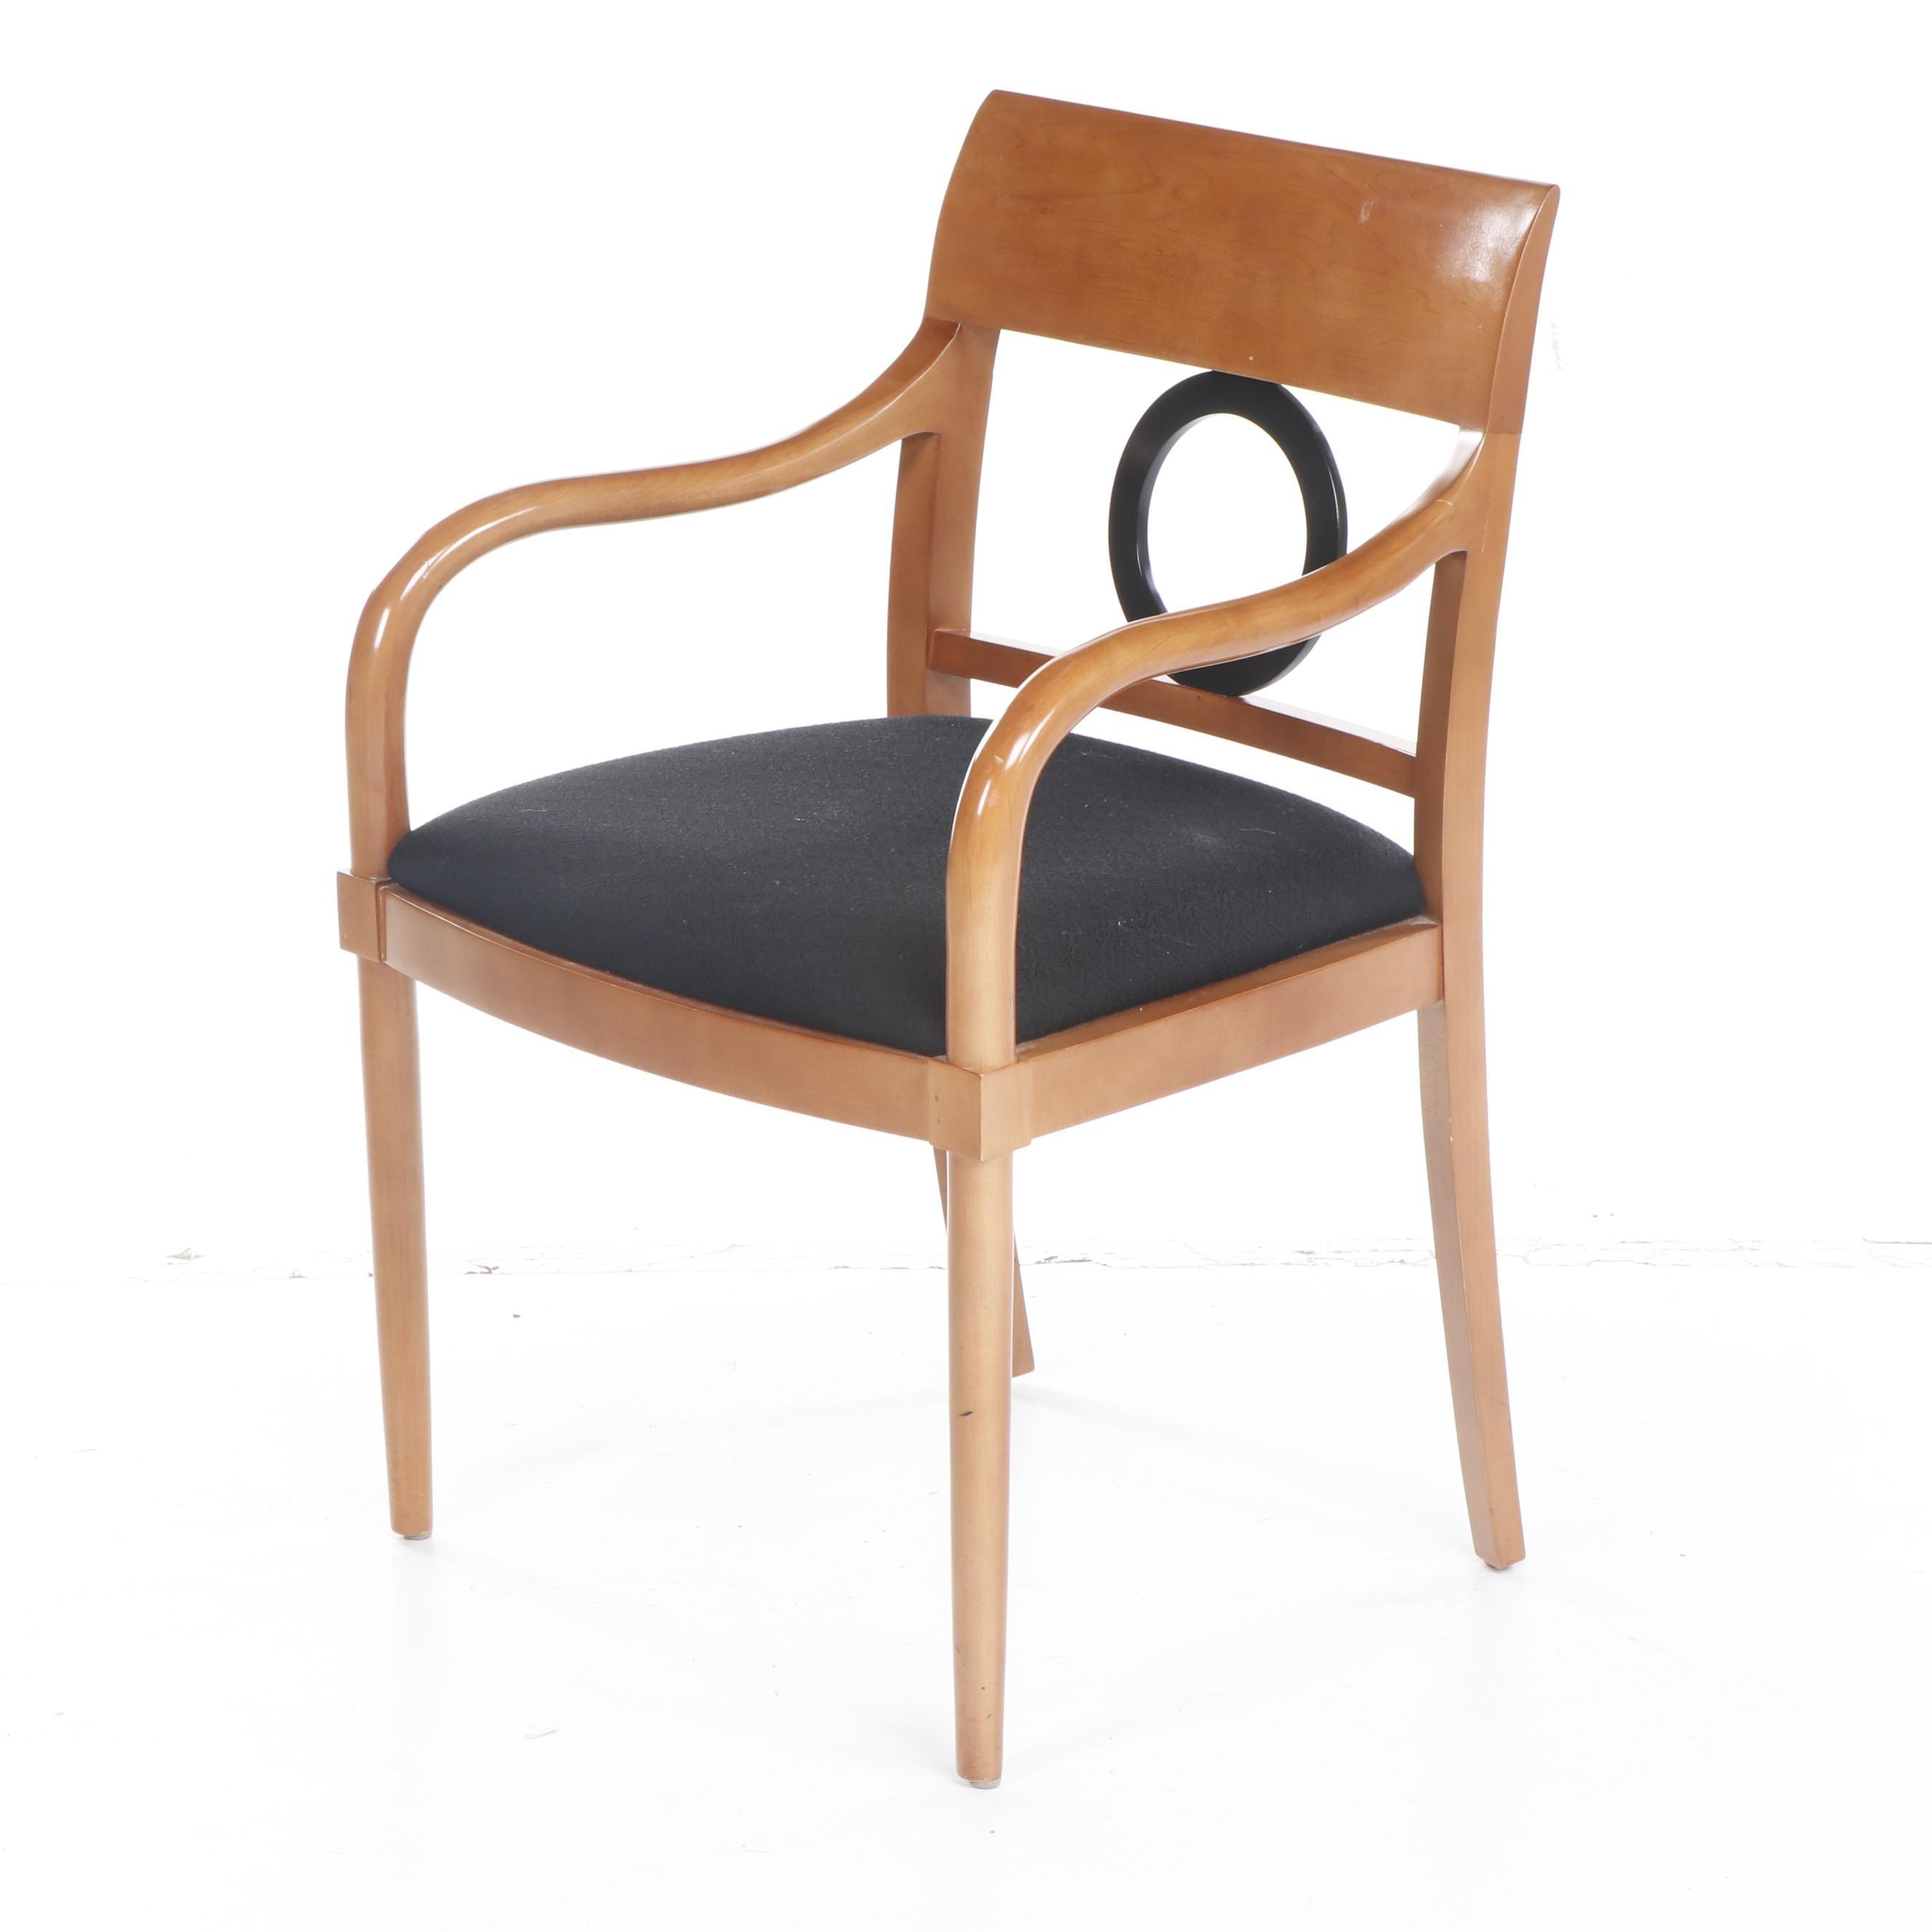 Bernhardt Modern Blonde and Parcel-Ebonized Wood Armchair, Late 20th Century